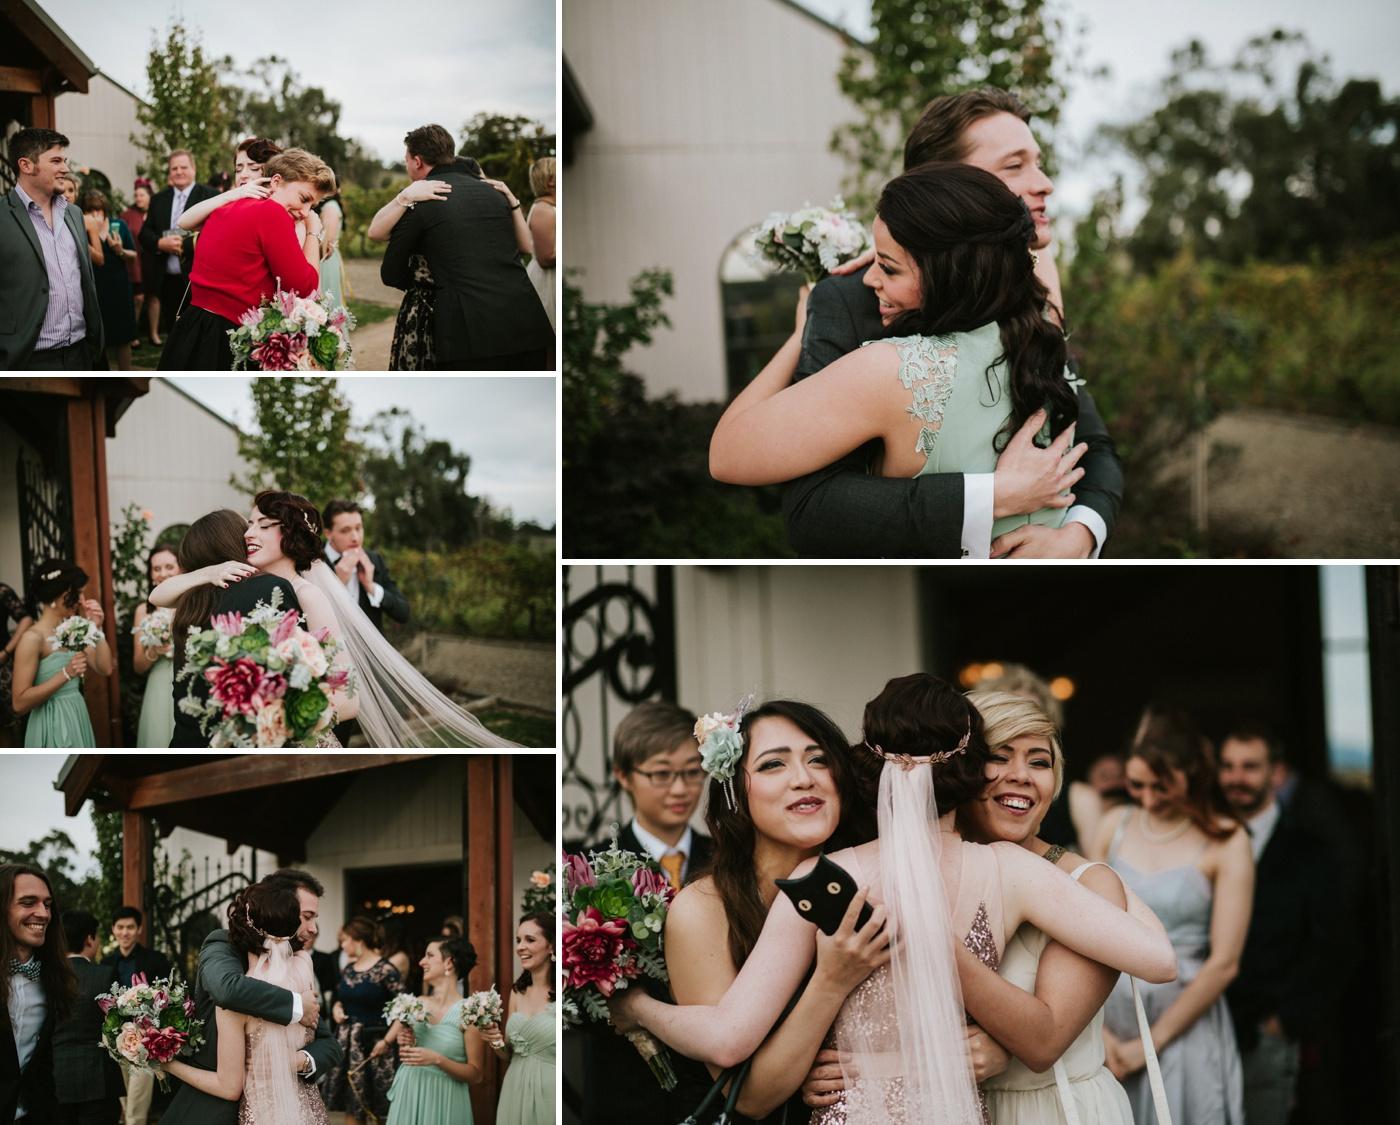 Emma&Morgan_Melbourne-Vintage-Elegant-Fun-Quirky-Yarra-Valley-Vineyard-Wedding_Melbourne-Wedding-Photography-58